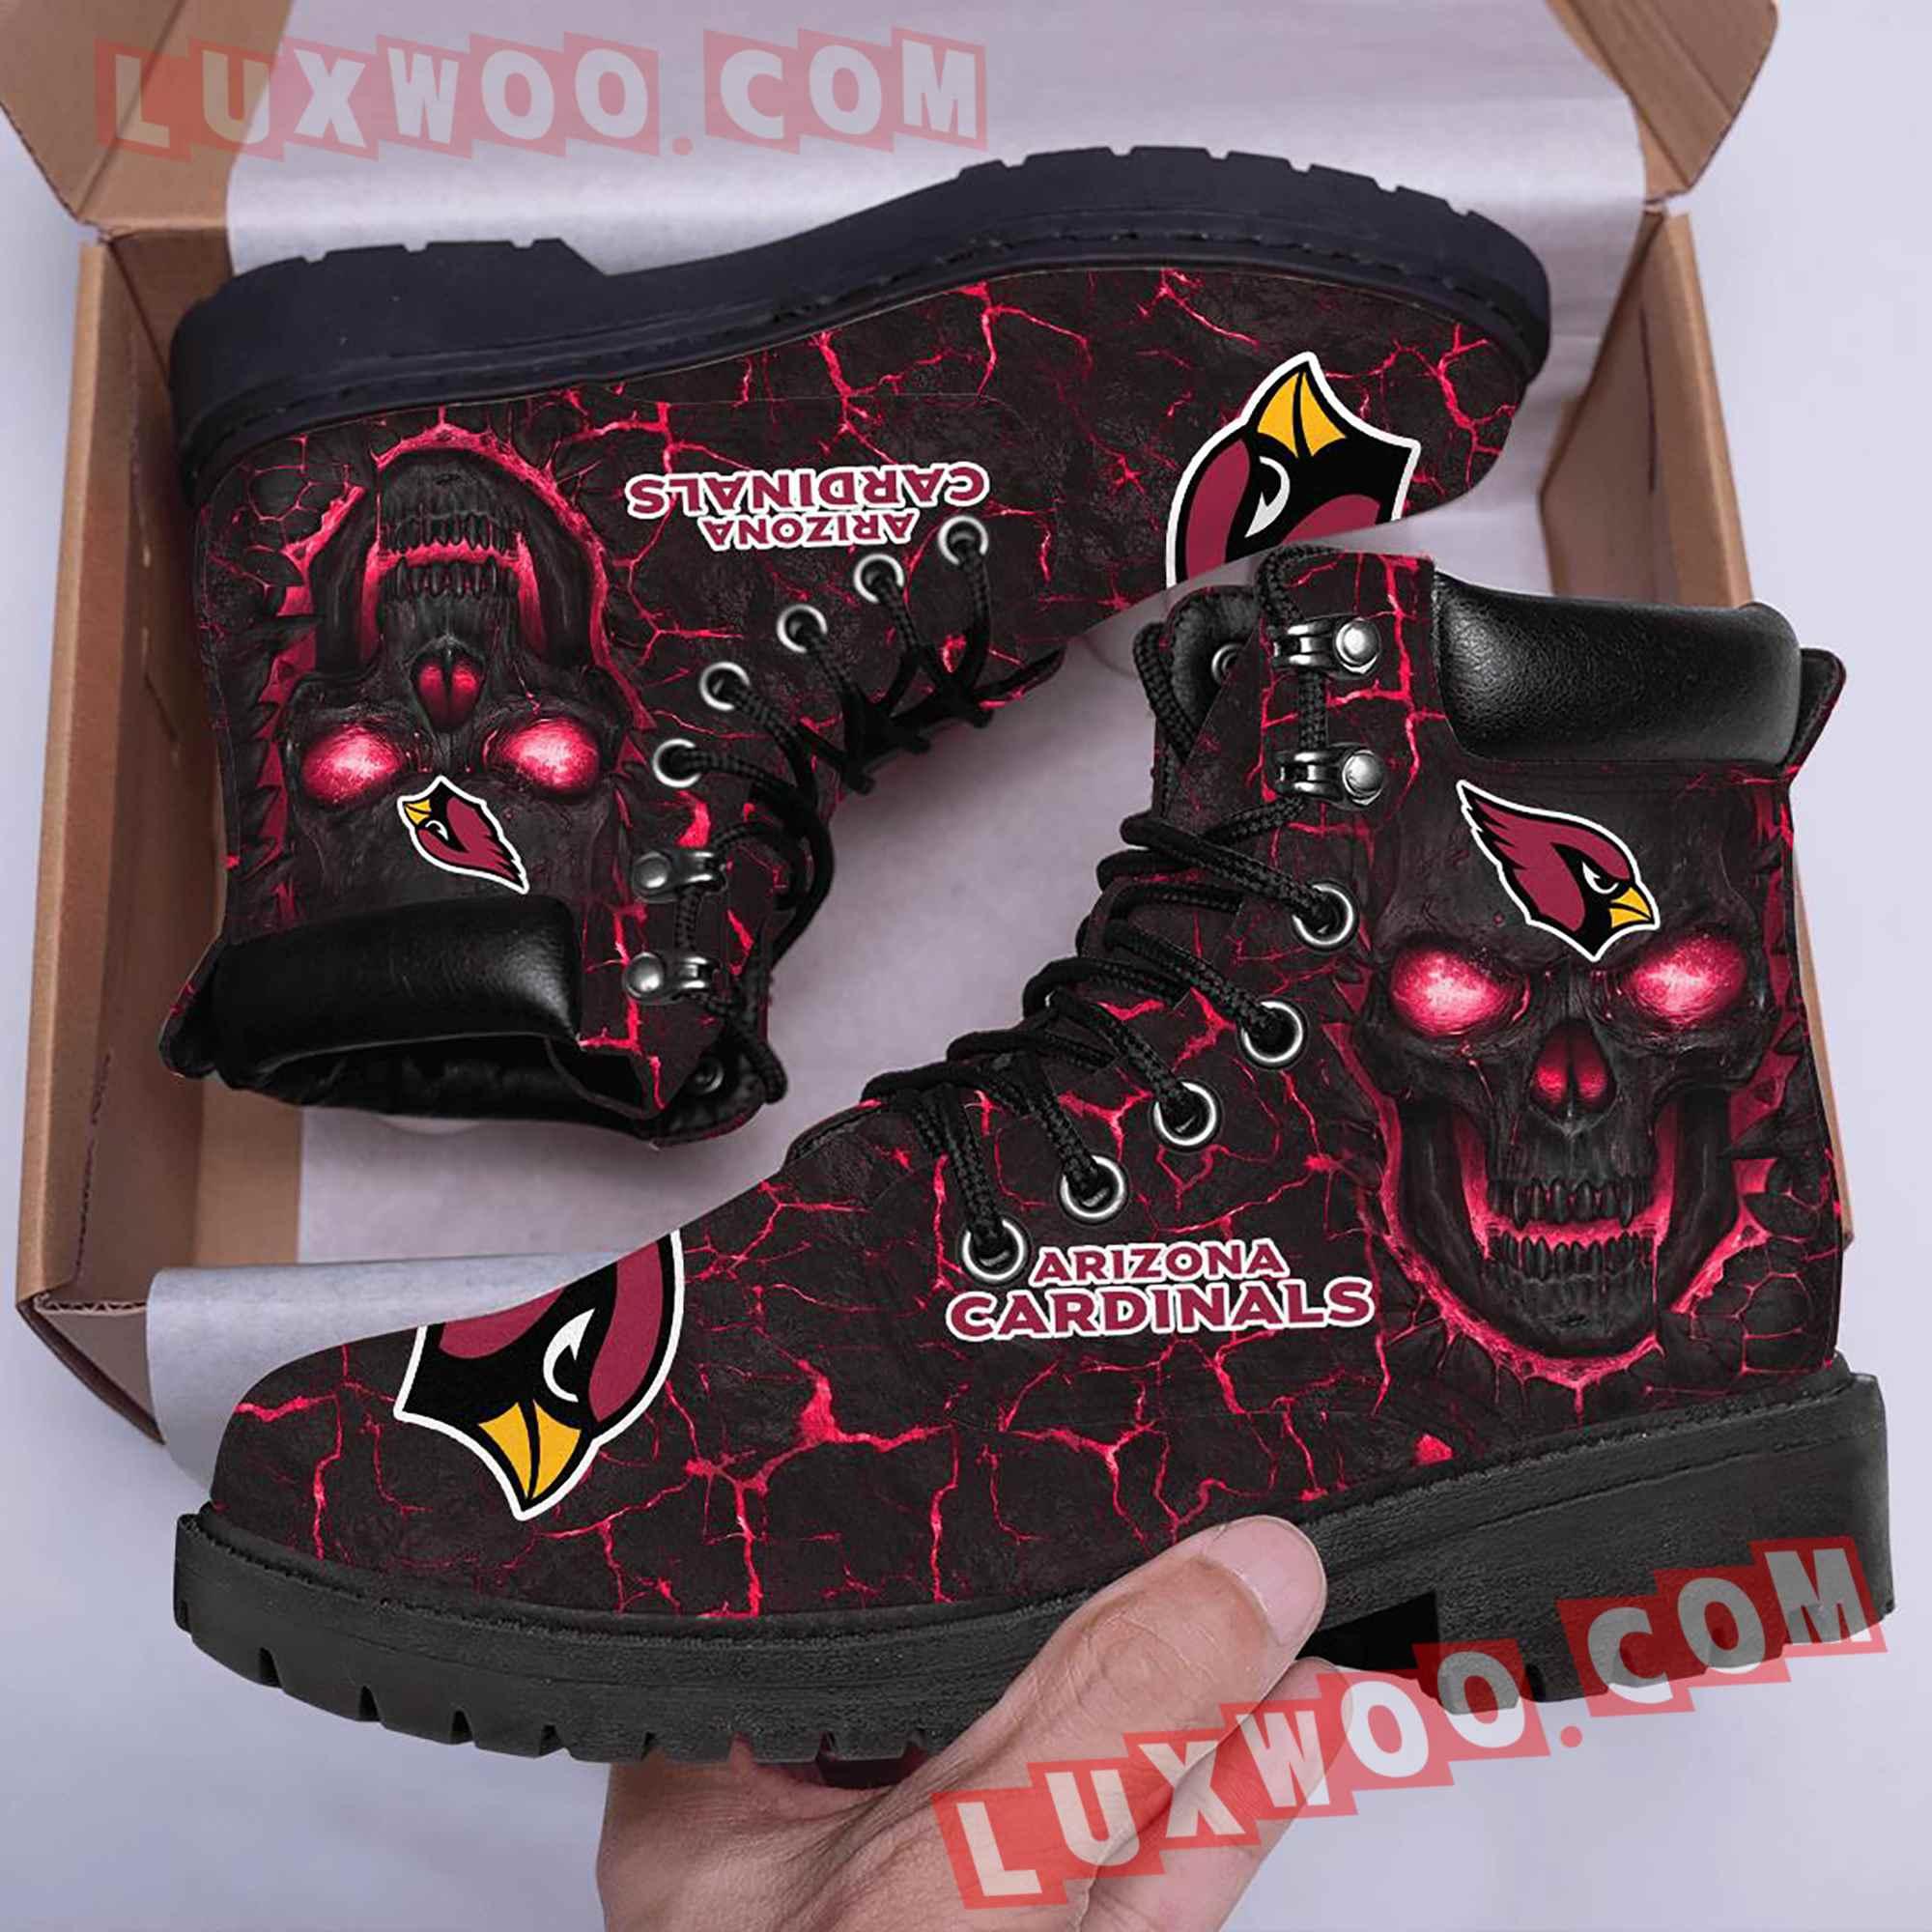 Arizona Cardinals Nfl Season Boots Shoes V1